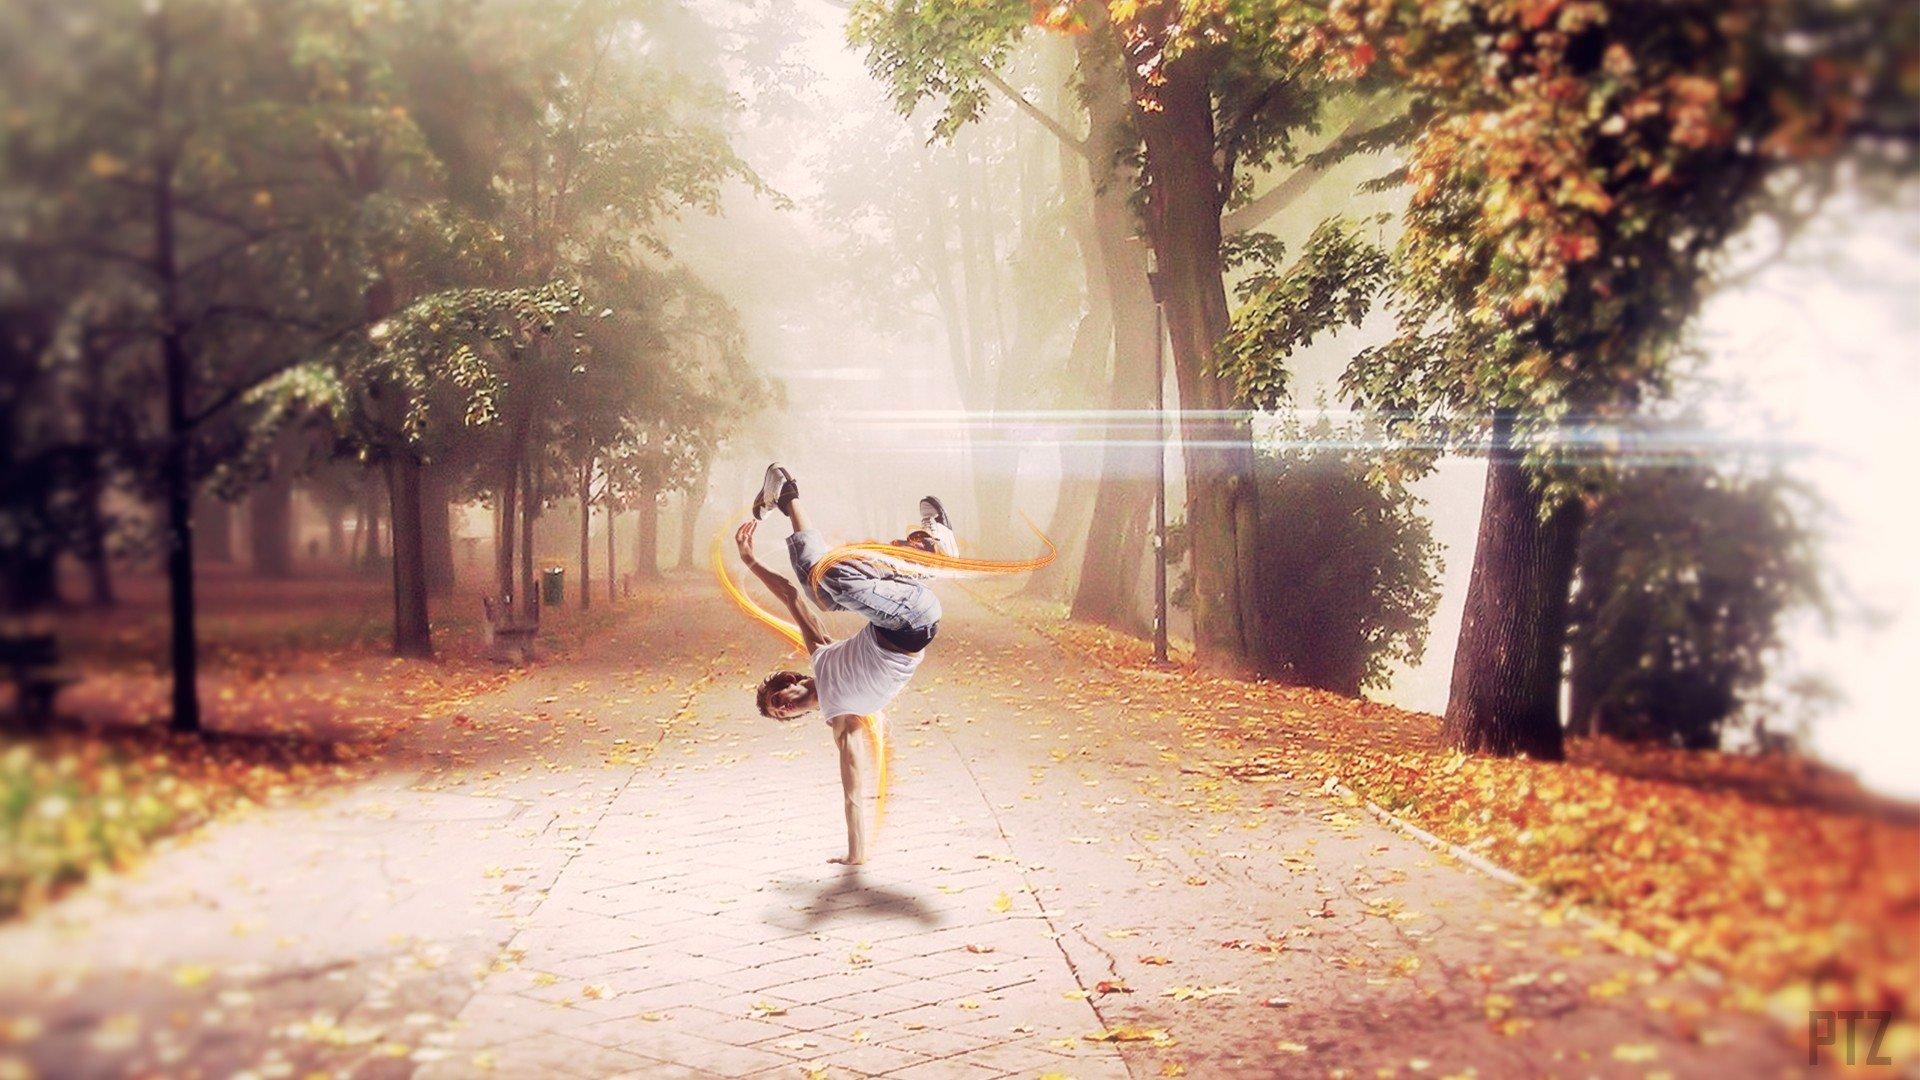 Bboy Wallpaper Full Hd Street Dance Park Iptz Wallpaper 1920x1080 240757